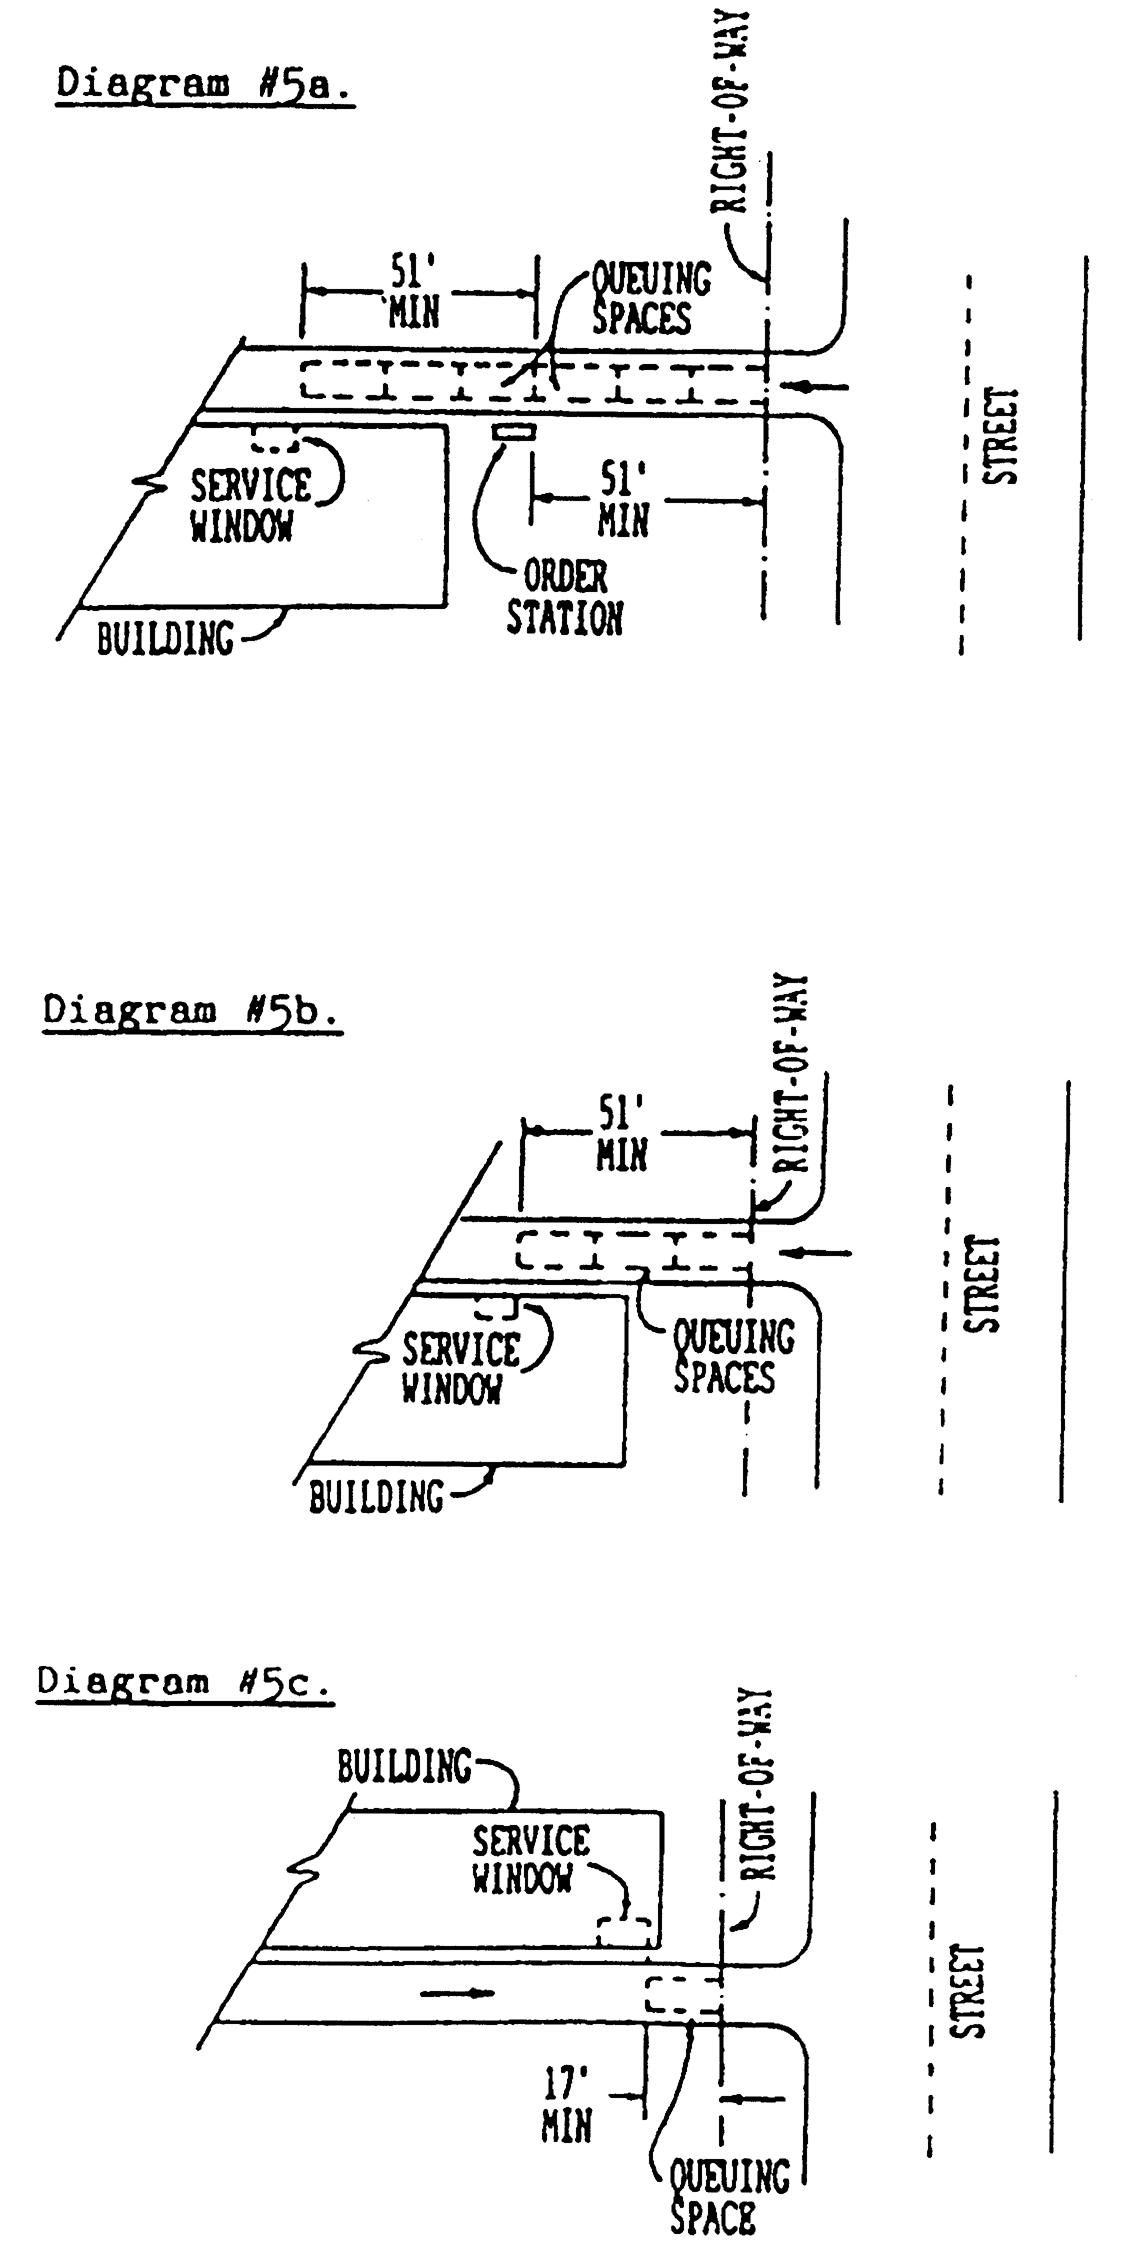 Pleasant Haulmark Wiring Diagram Haulmark Circuit Diagrams Circuit Diagram Wiring Cloud Mangdienstapotheekhoekschewaardnl